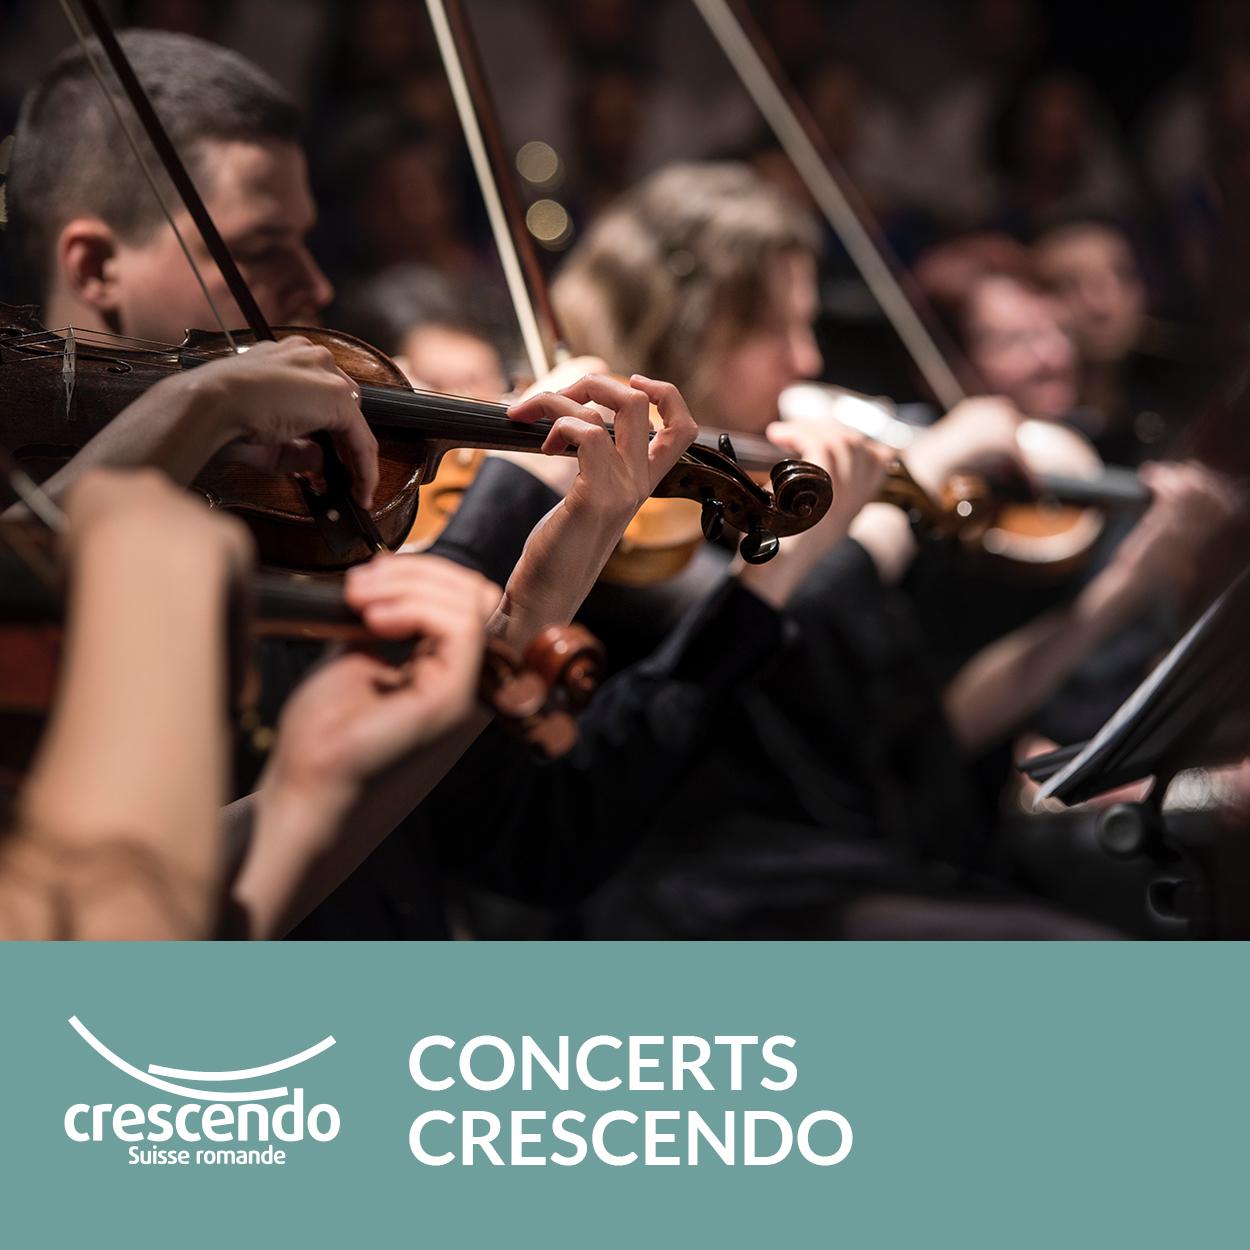 Concert Crescendo.jpg